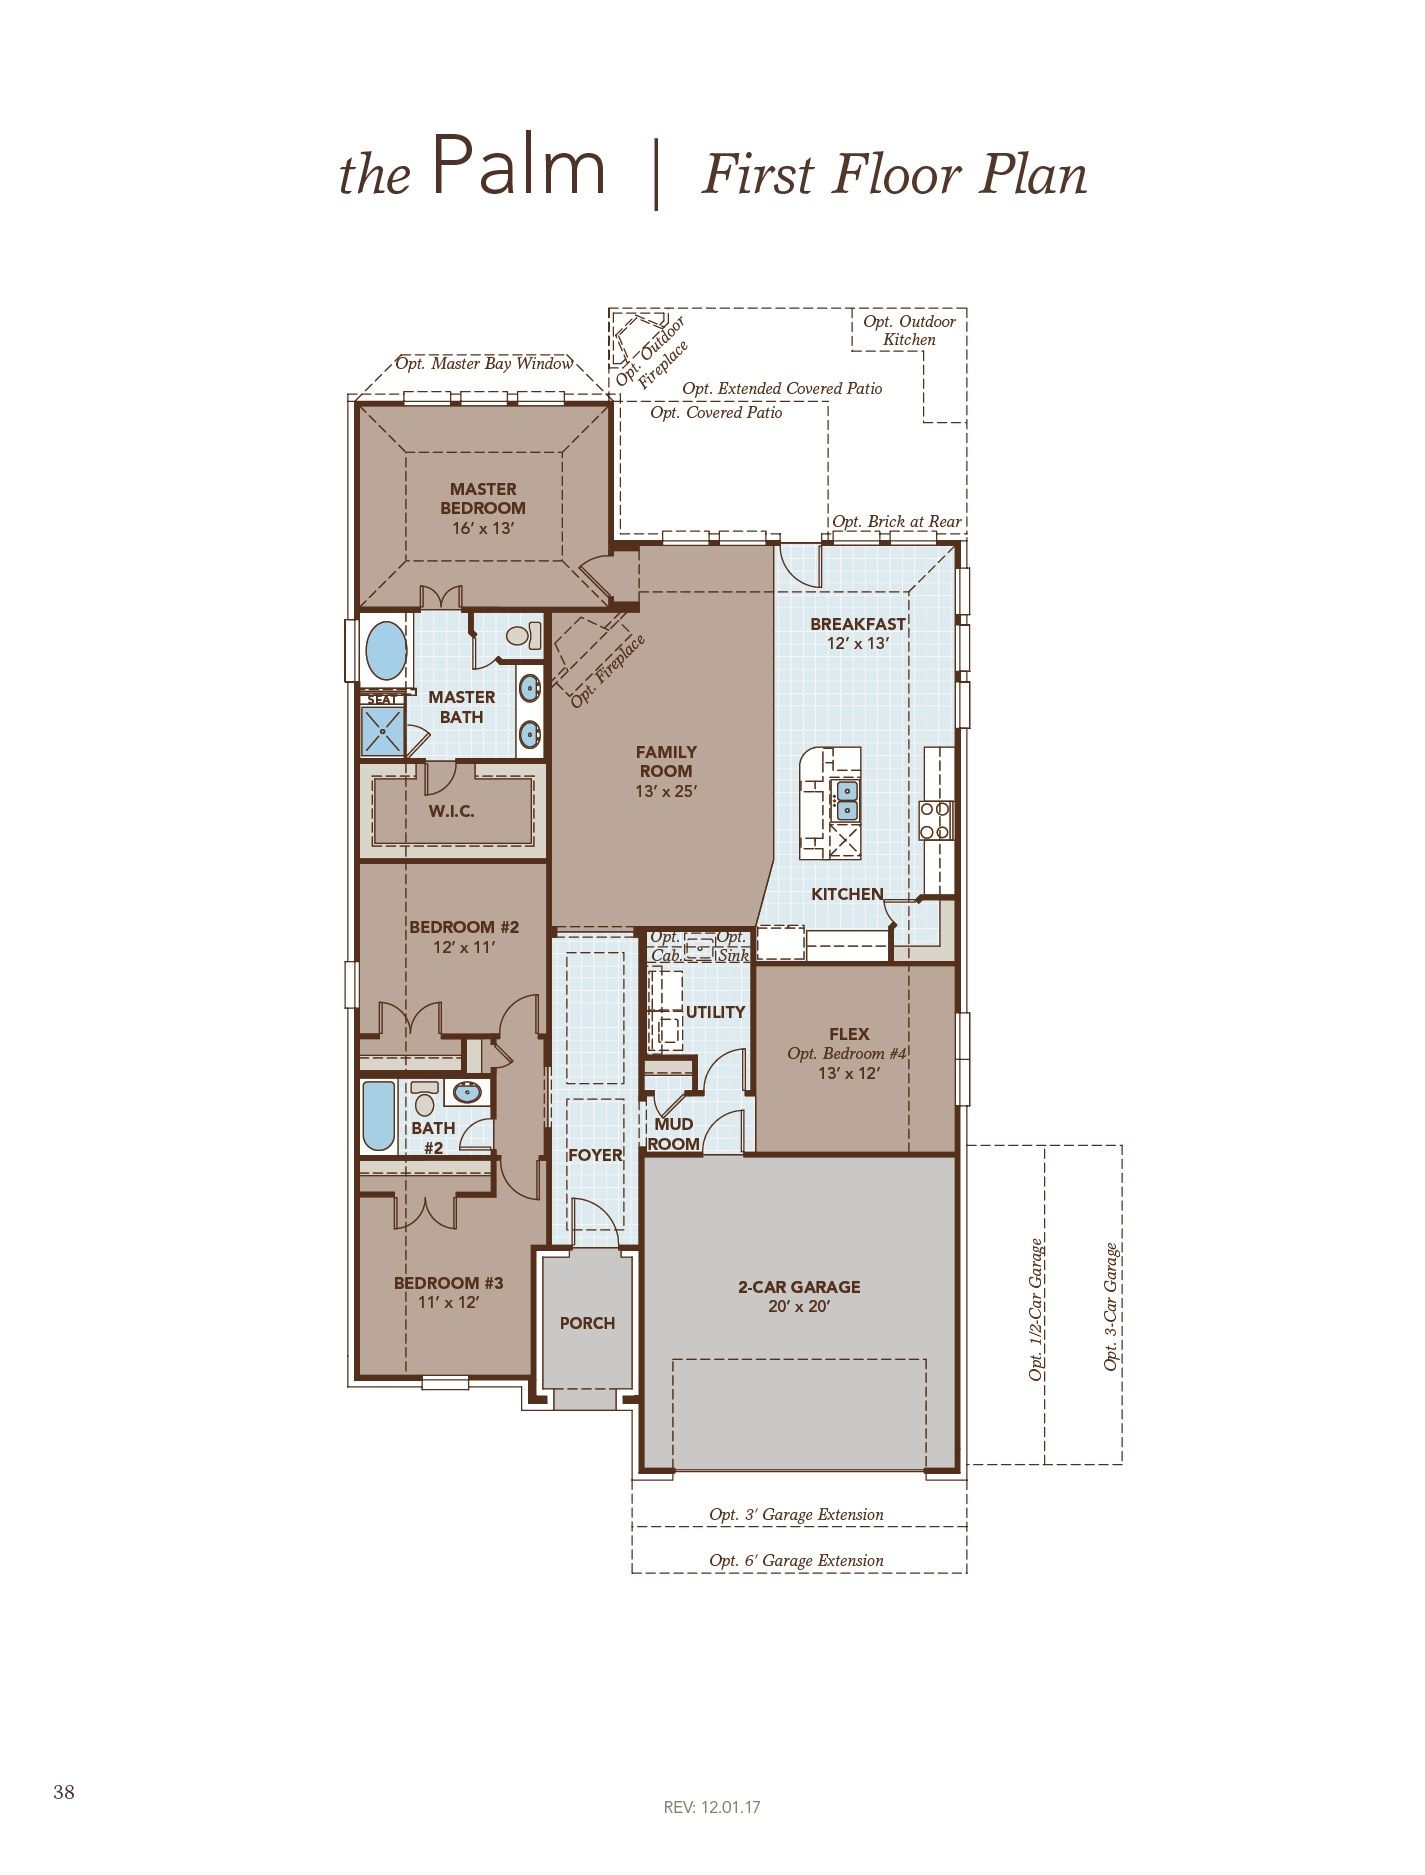 Palm First Floor Plan